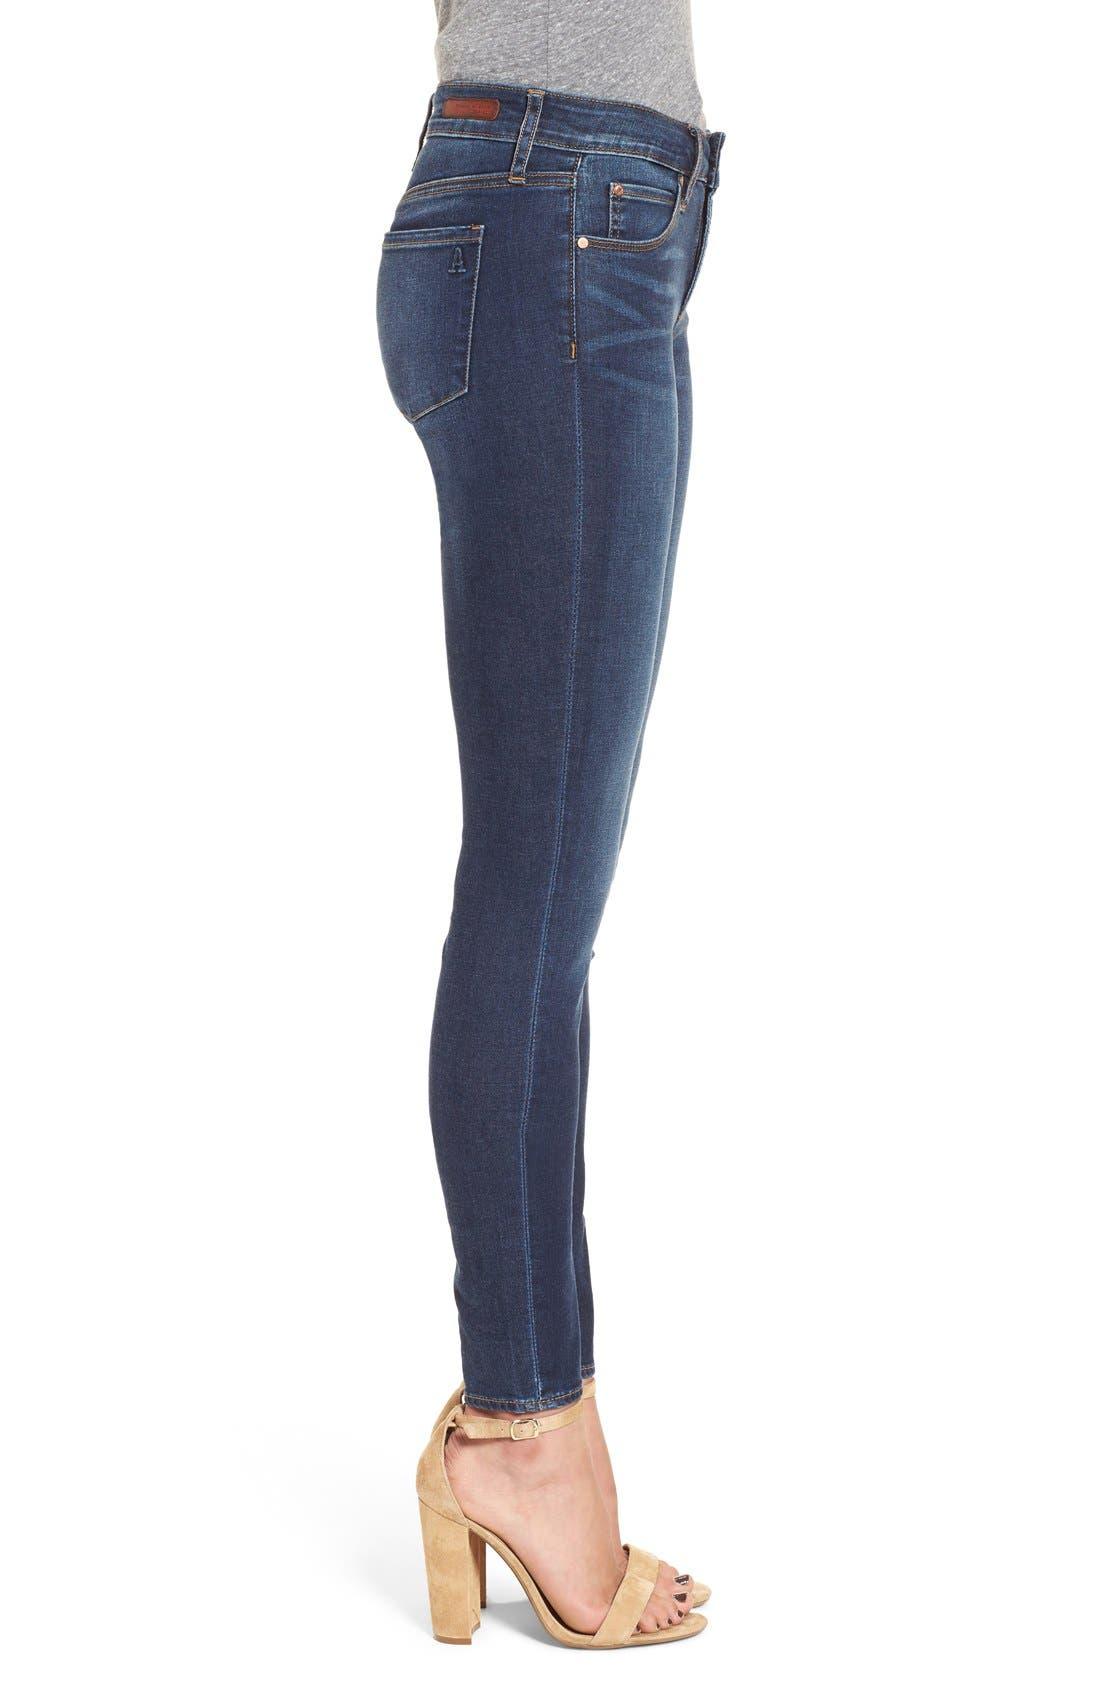 Alternate Image 3  - Articles of Society 'Mya' Skinny Jeans (Glendale)